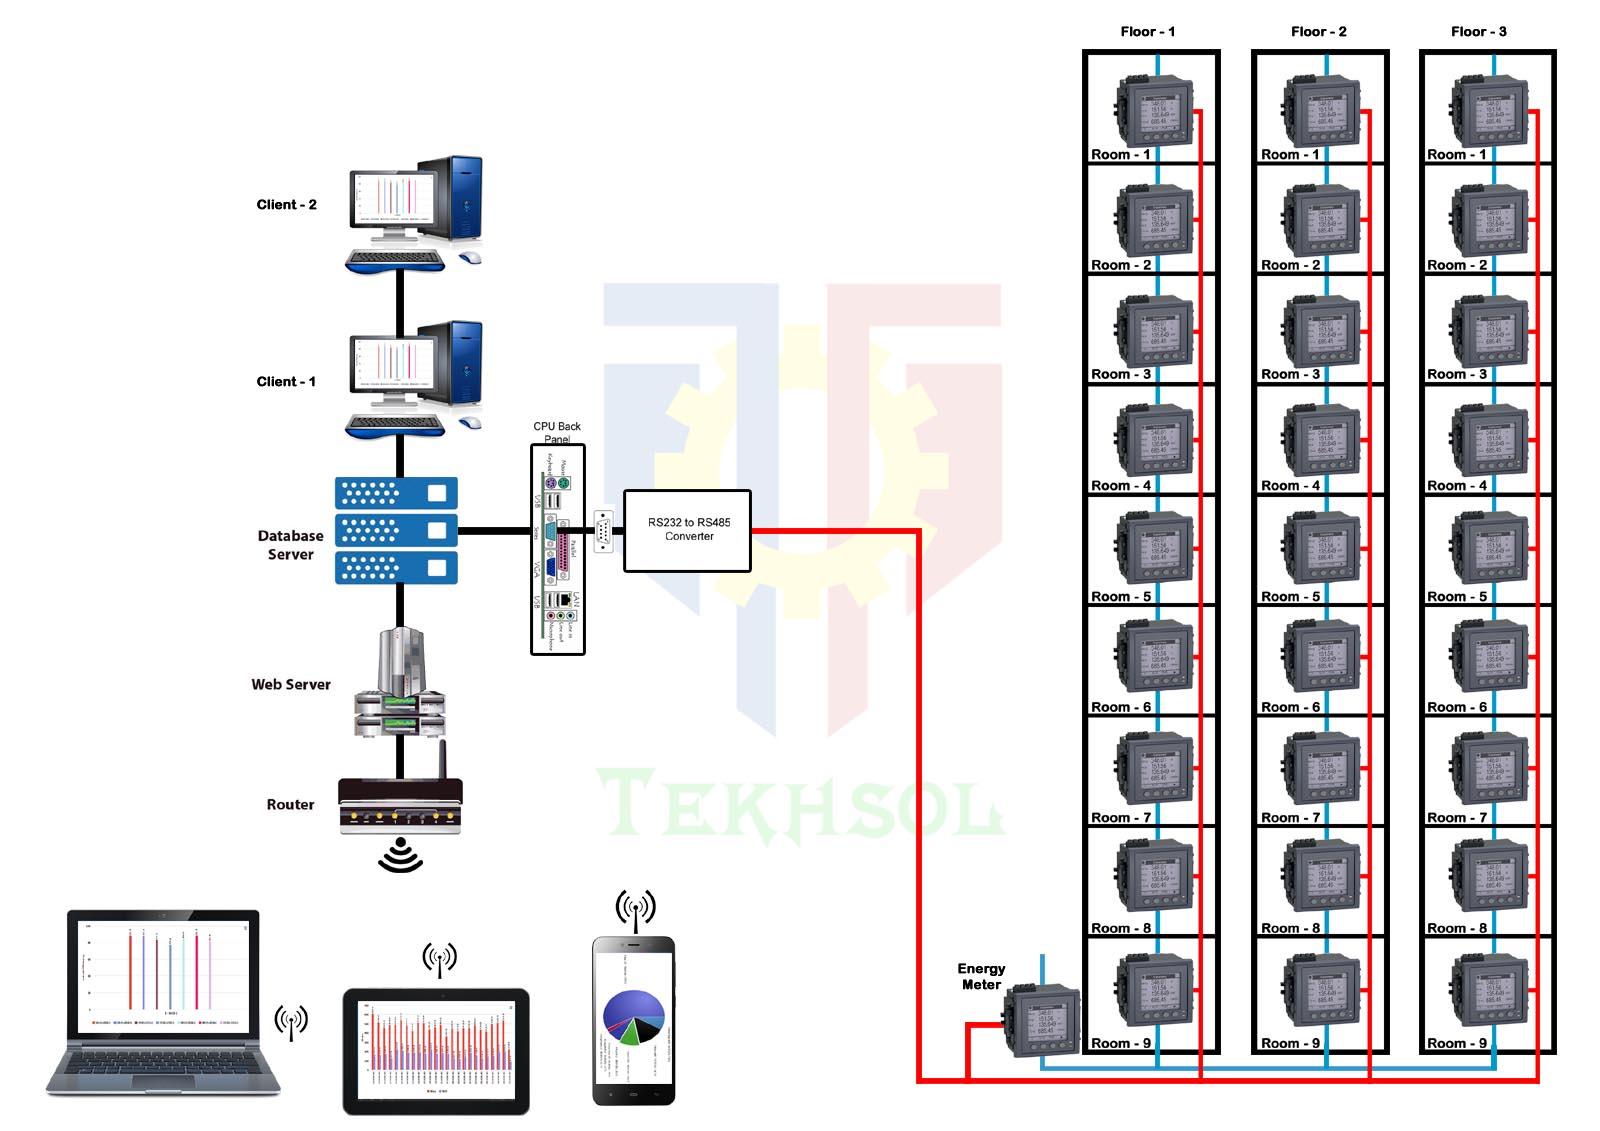 Tekhsol Hardware Monitor Block Diagram For Web Based Monitoring System Energy Wired